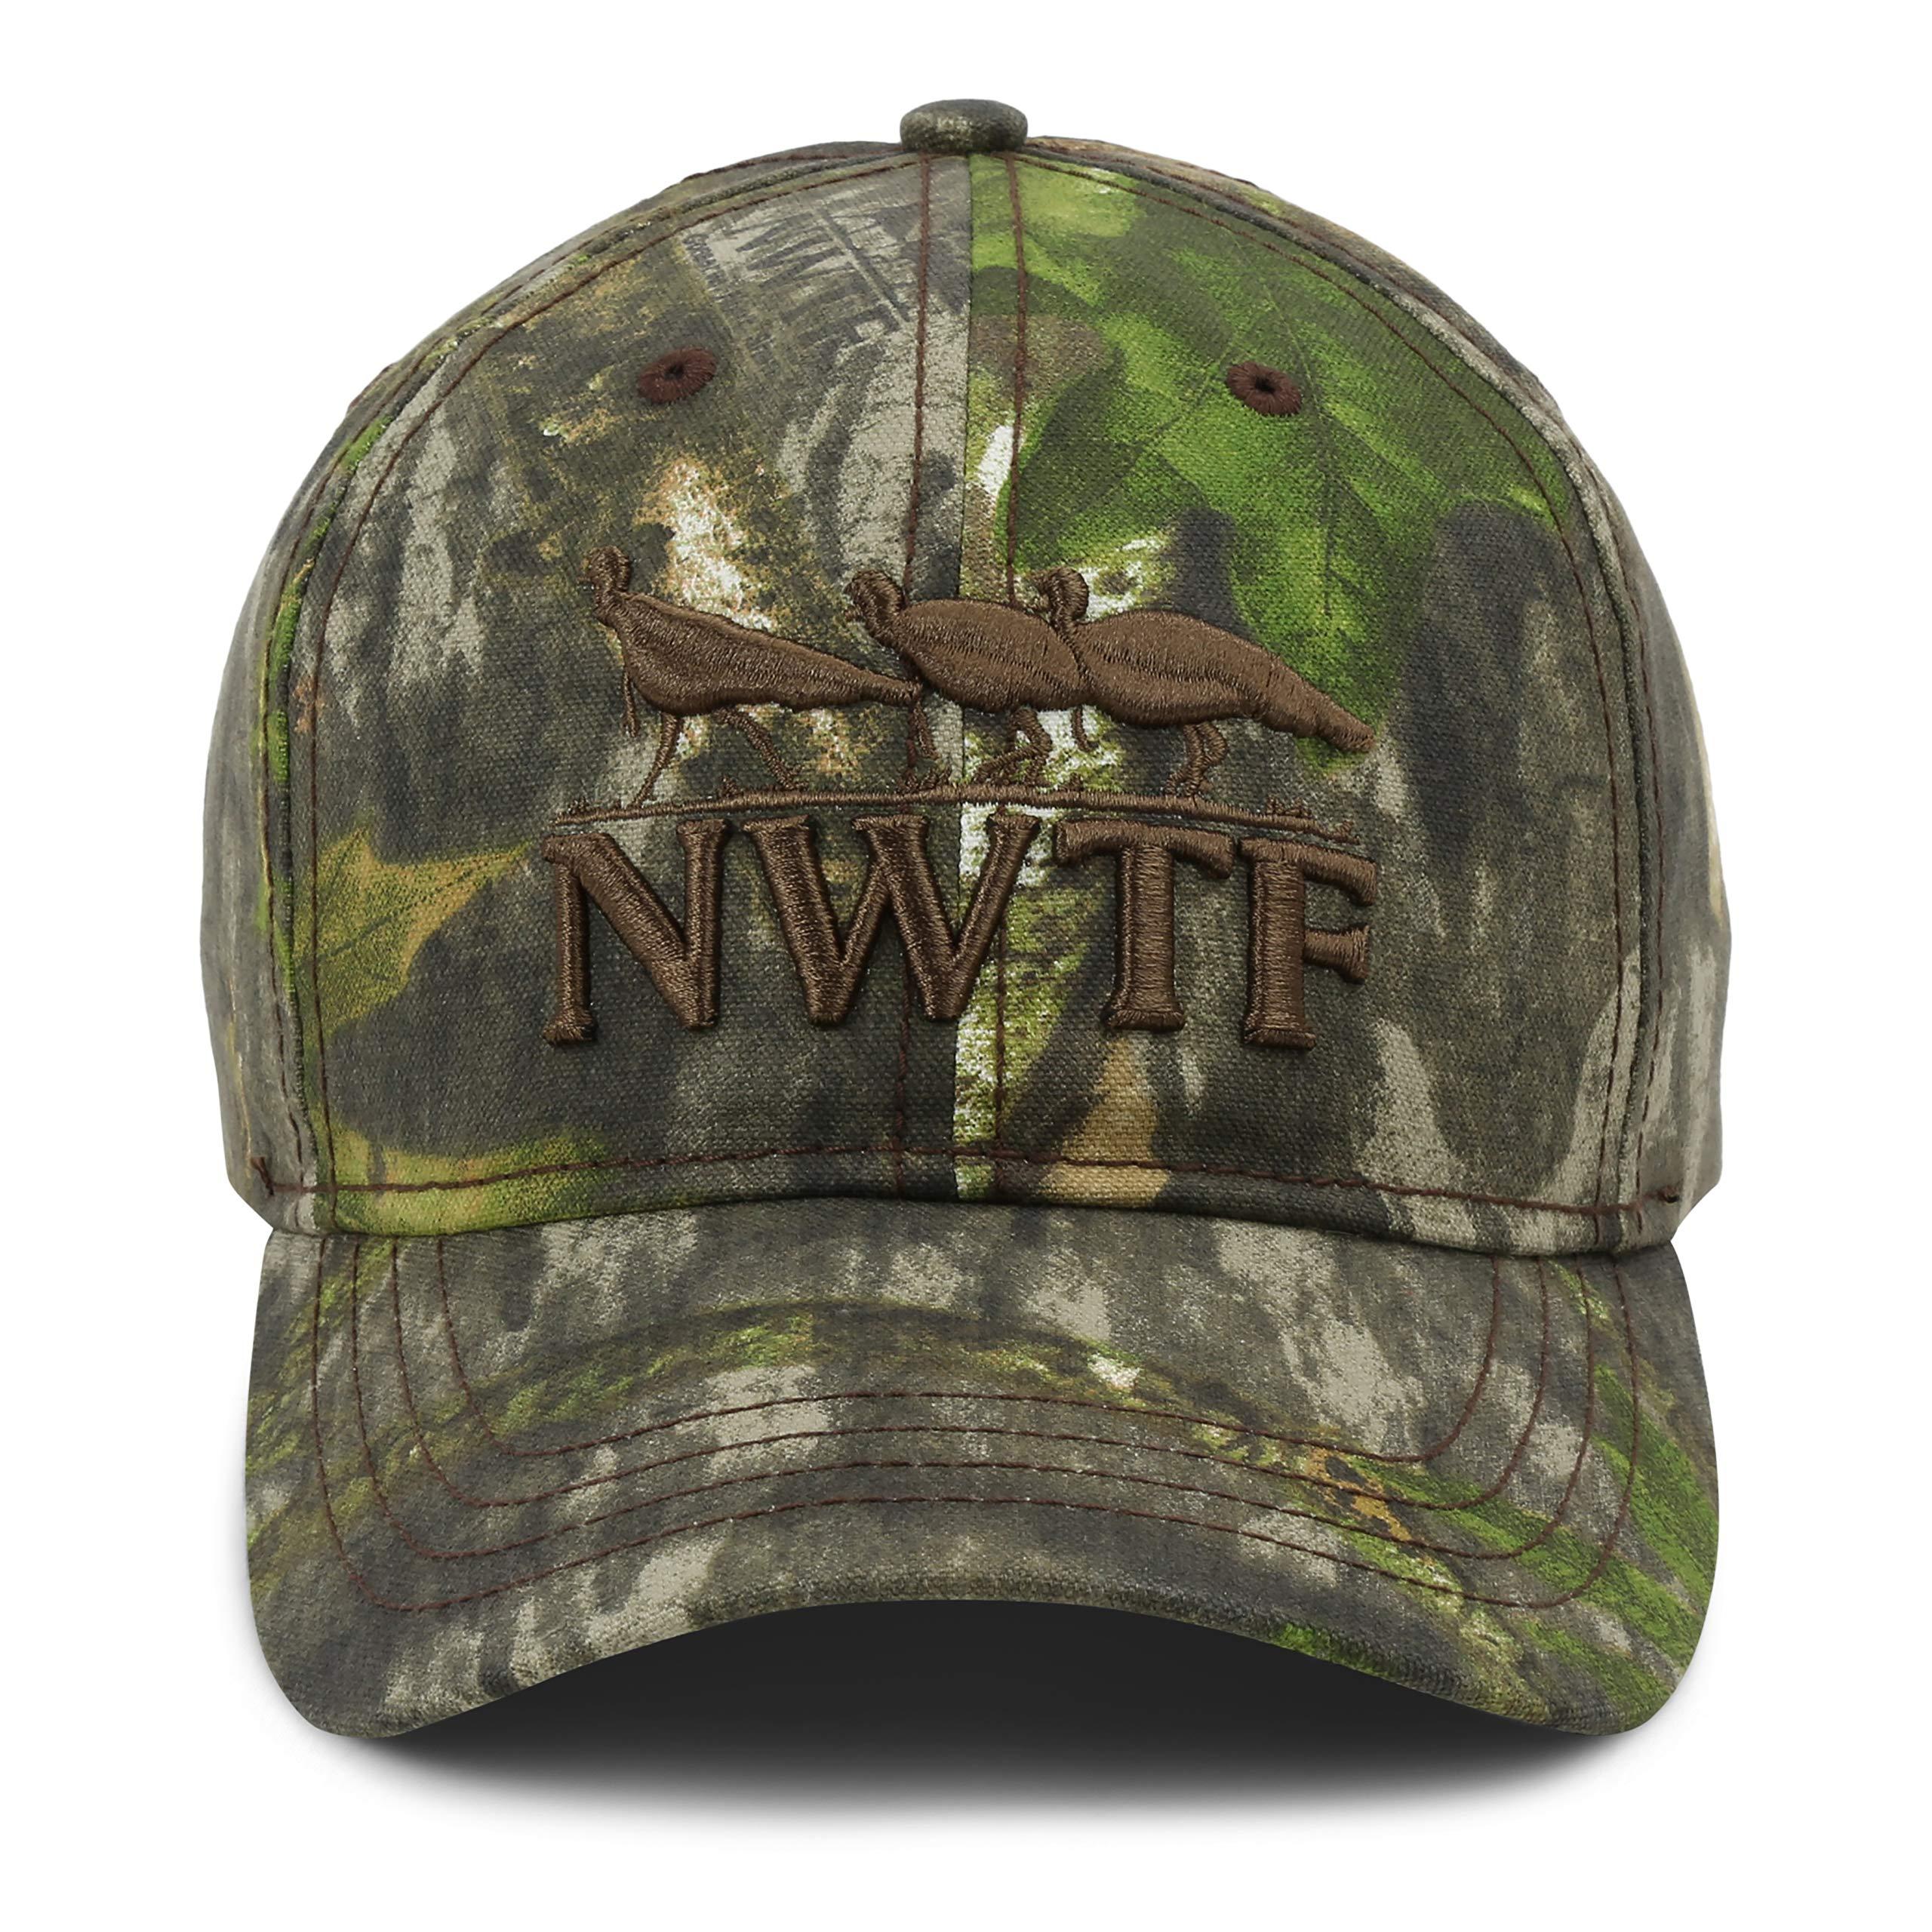 NWTF Mossy Oak Camo Cap by National Wild Turkey Federation (Image #2)